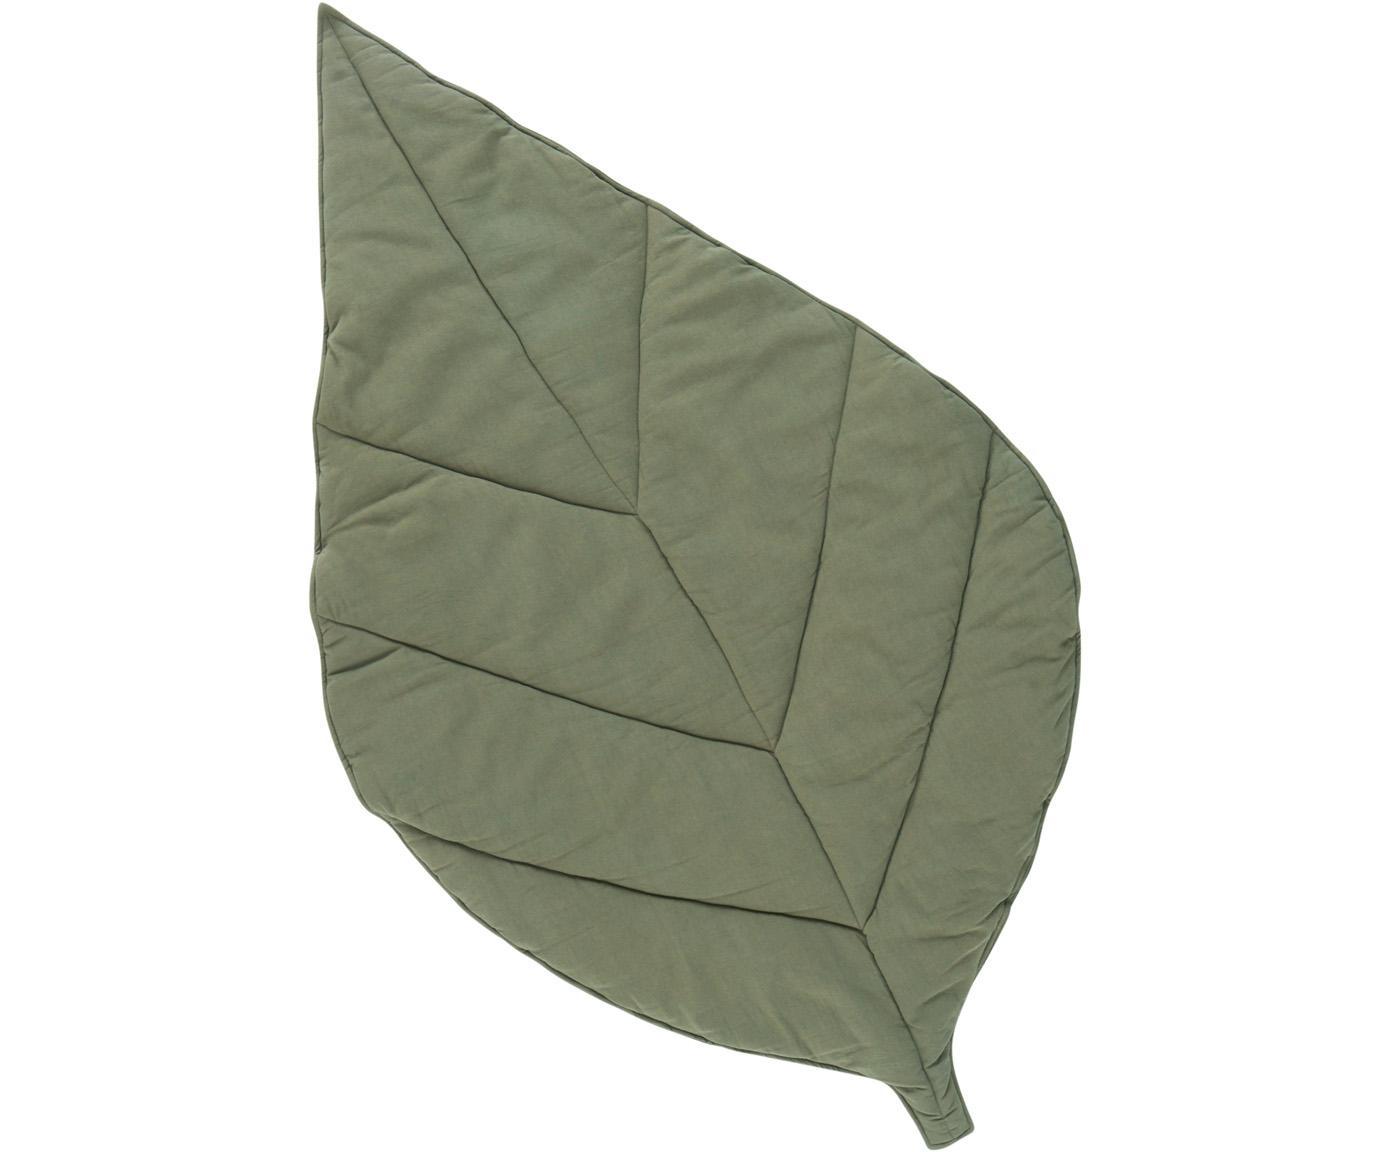 Alfombra de juegos Keaton, Tapizado: 100%ecológicoalgodón, Verde, An 100 x L 165 cm